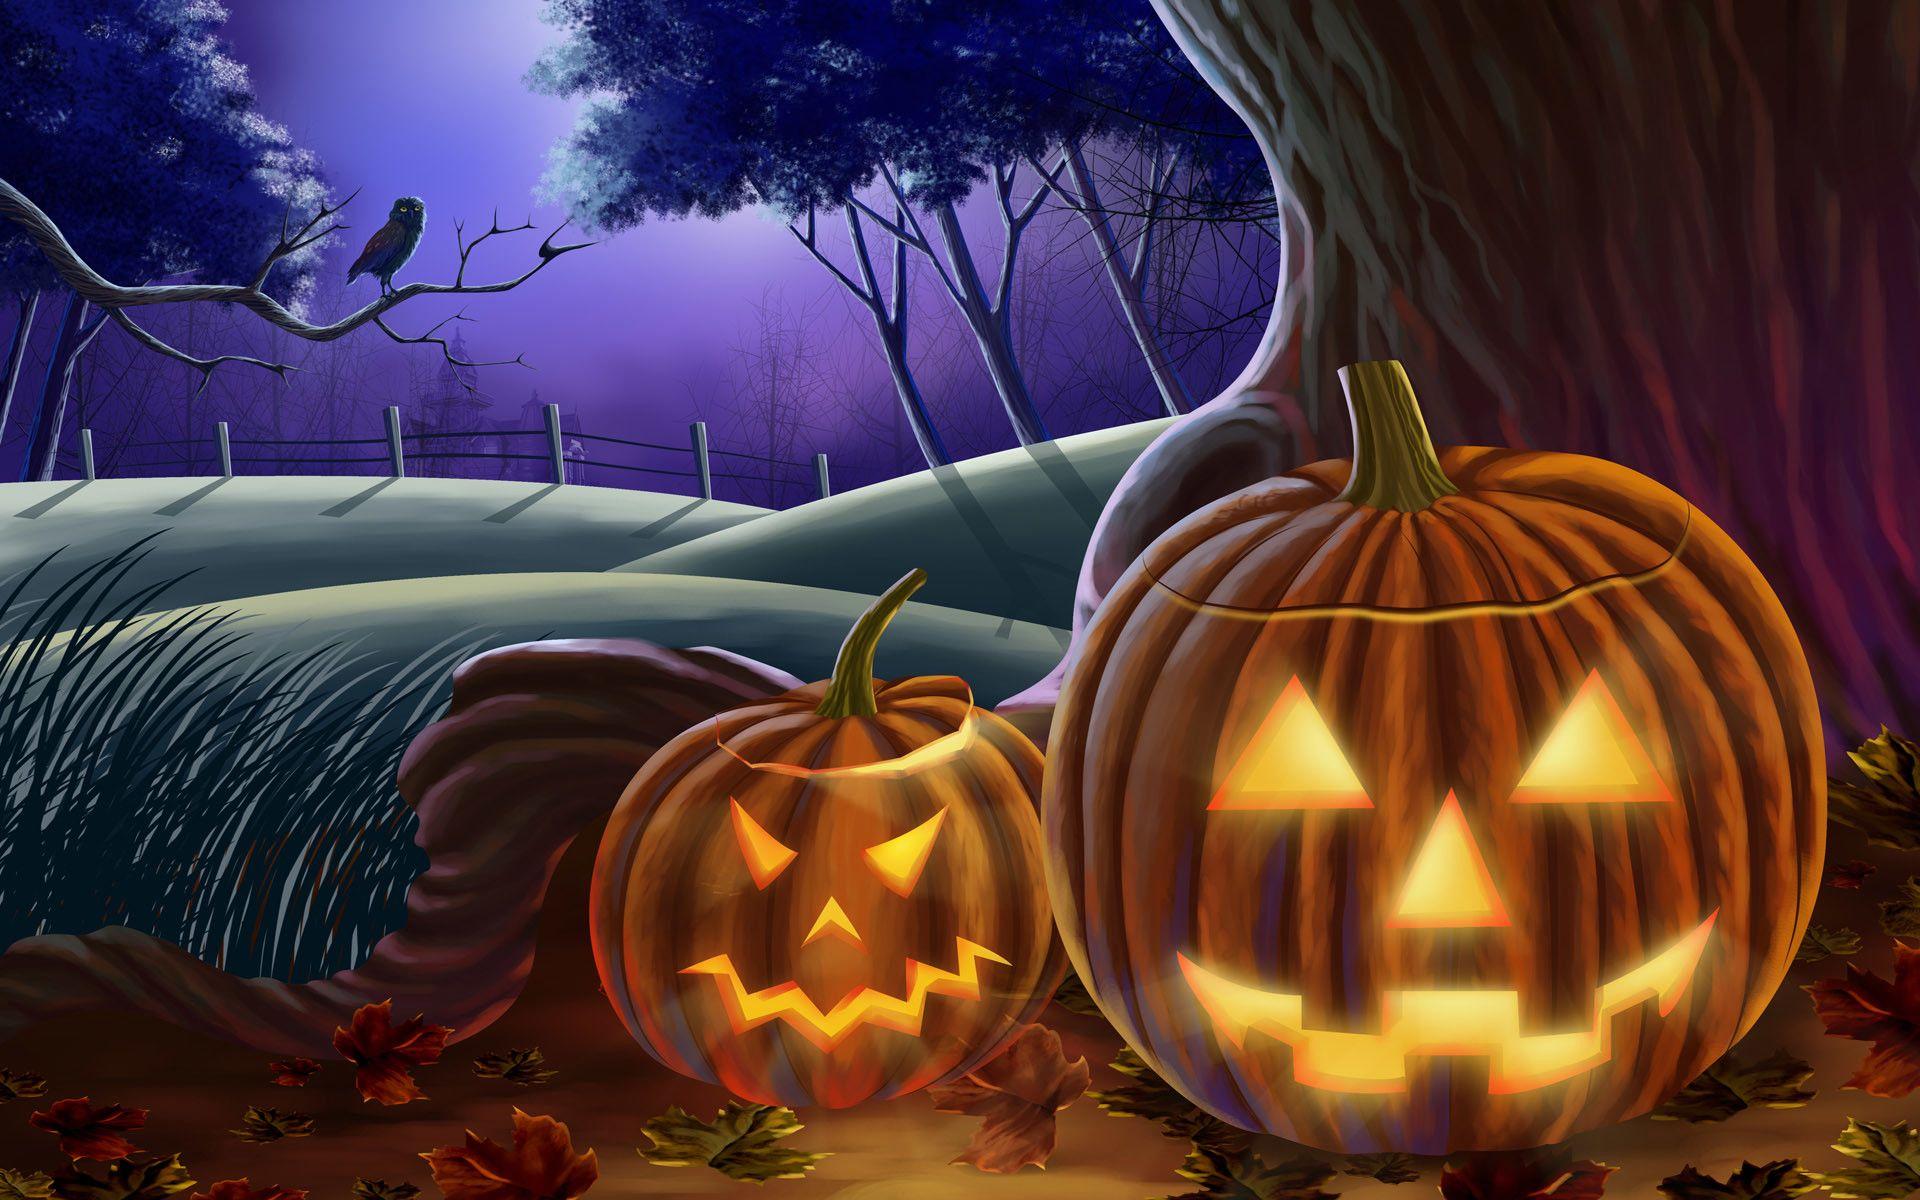 Animated Wallpaper Windows 10 56 Images Pumpkin Wallpaper Halloween Images Halloween Desktop Wallpaper